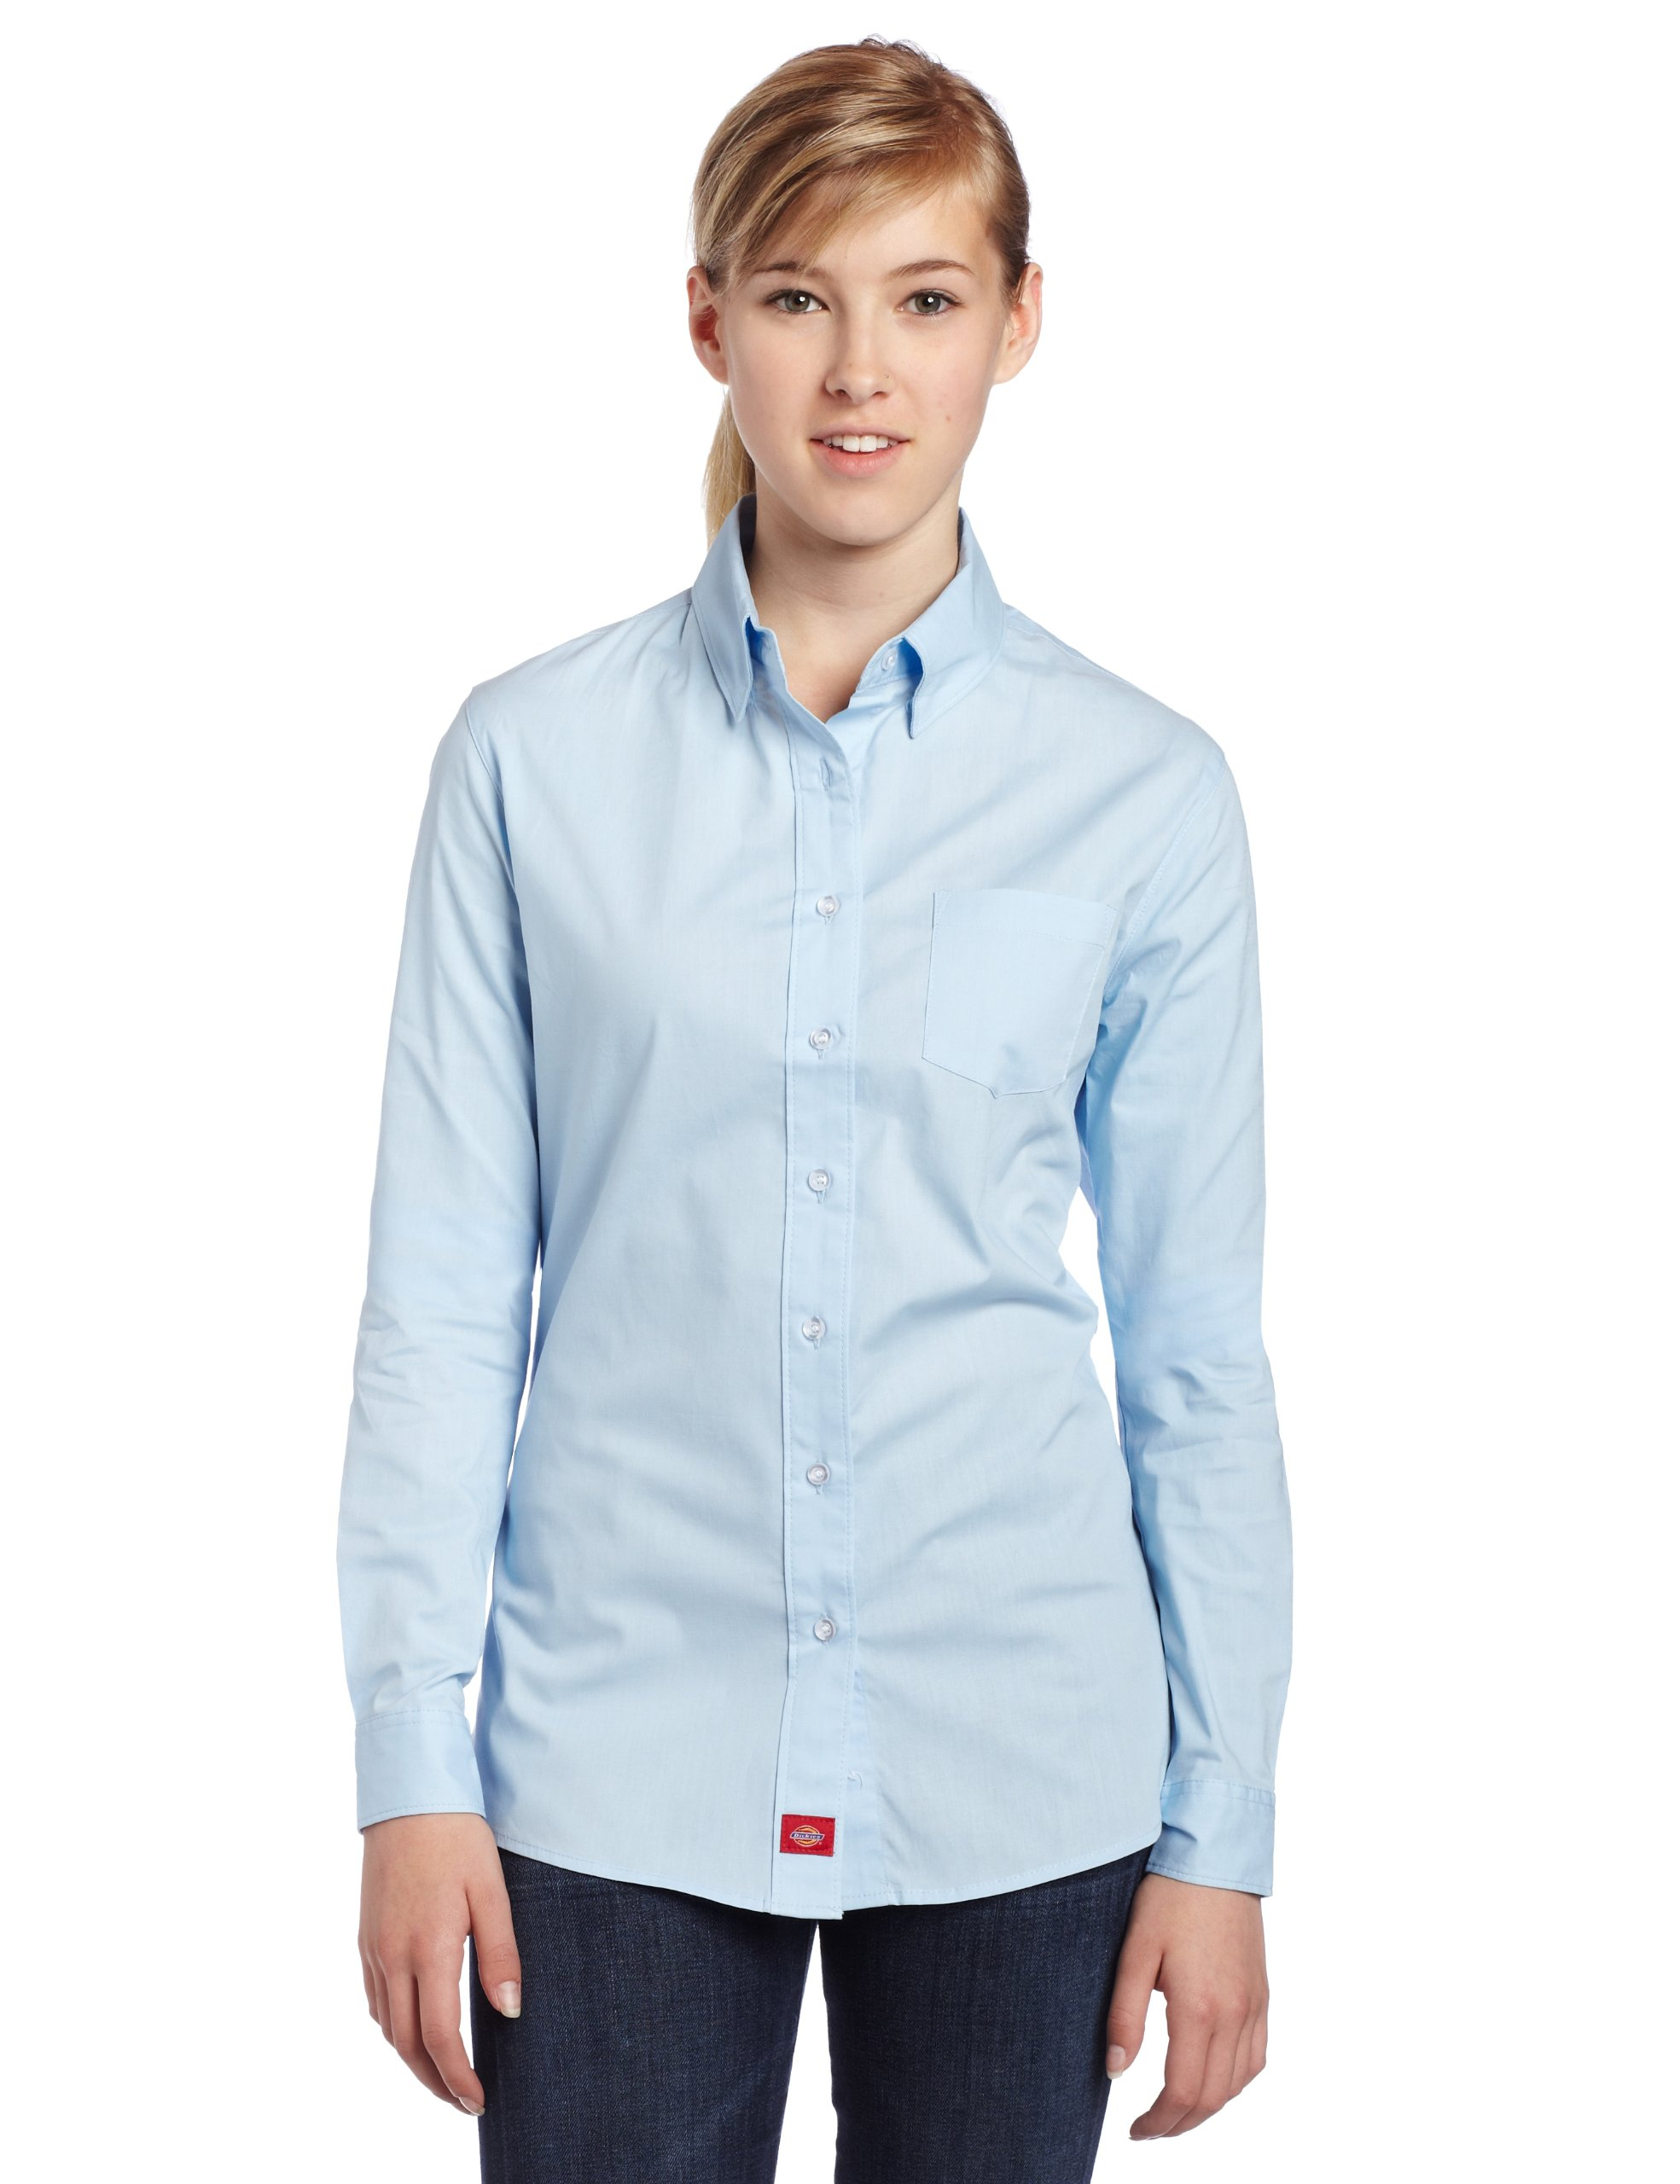 Dickies Girl Juniors Long Sleeve Button Front Poplin Shirt,Baby Blue,Xlarge by Dickies Girl